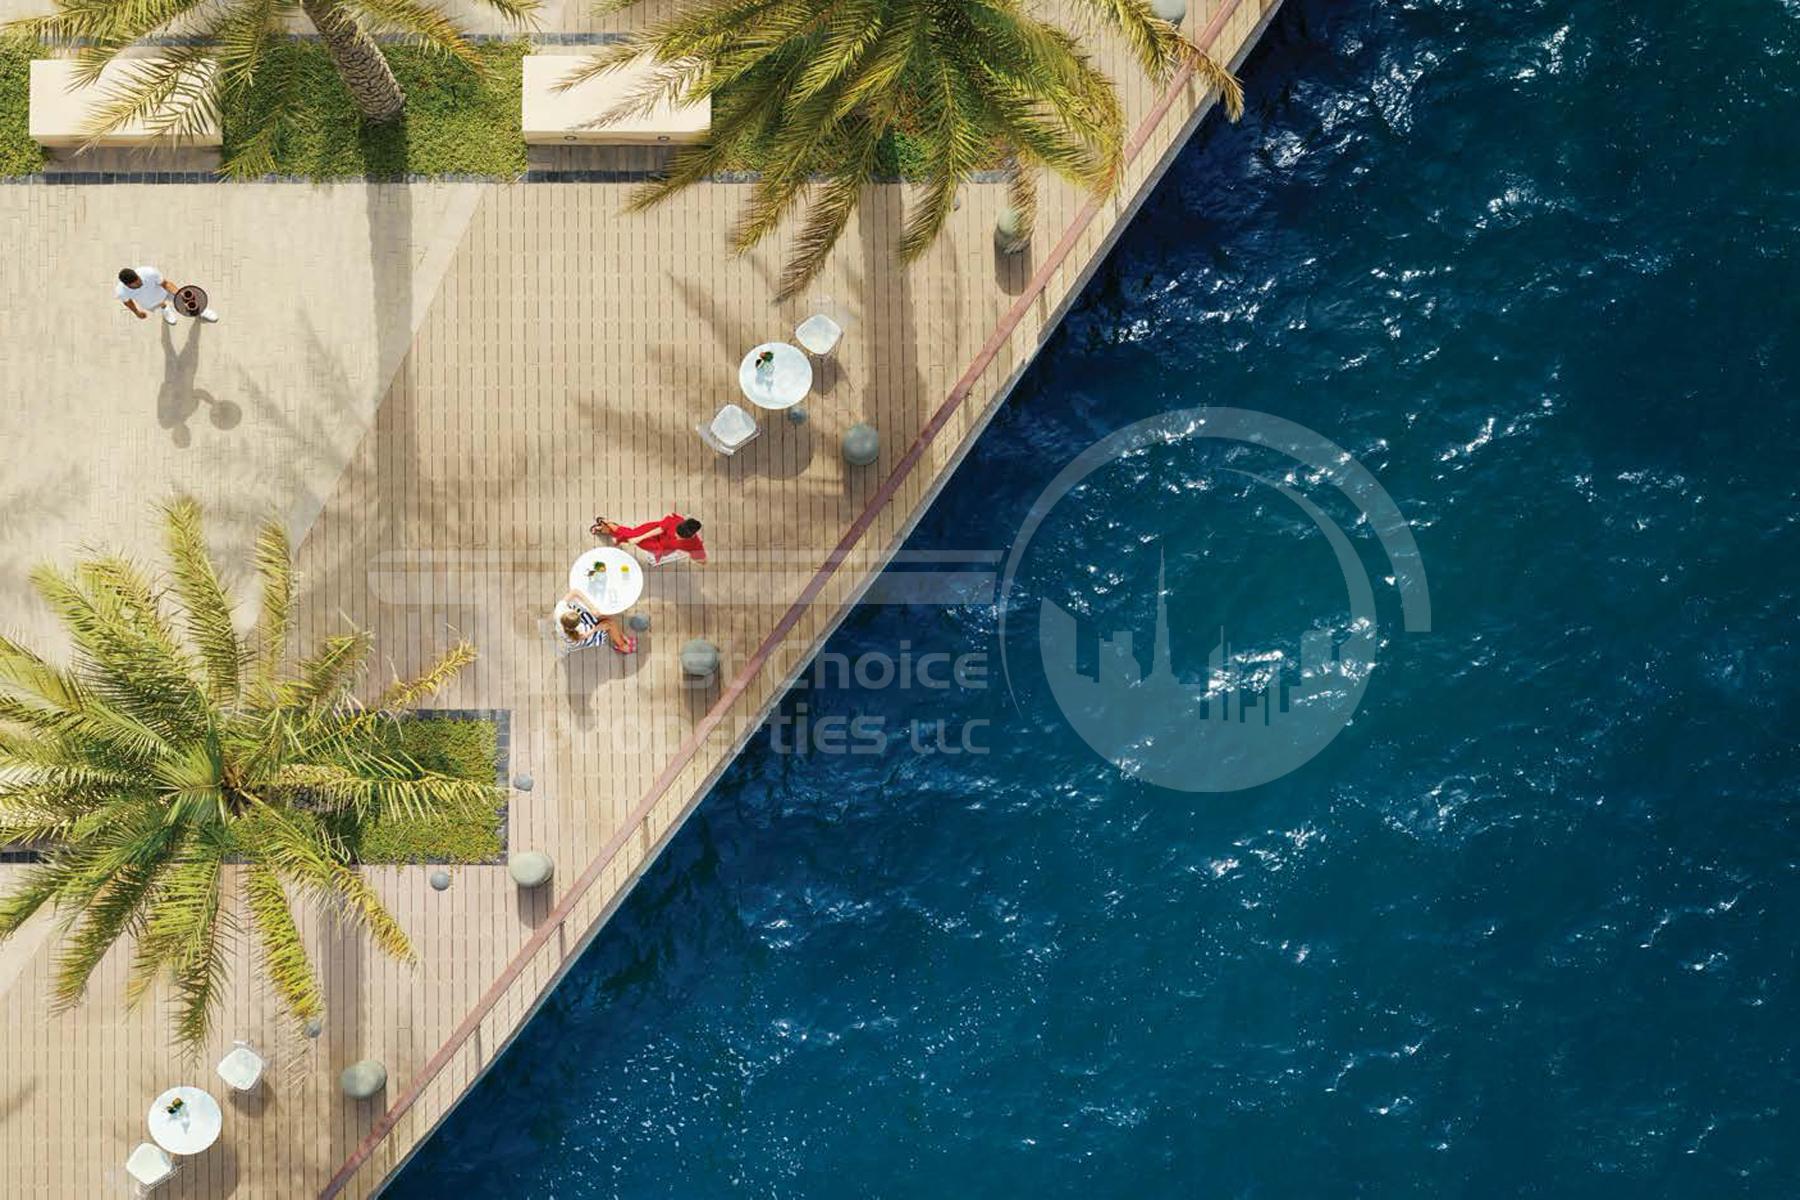 Studio - 1 Bedroom - 2 Bedroom - 3 Bedroom Apartment - Water's Edge - Yas Island - Abu Dhabi - UAE (12).jpg